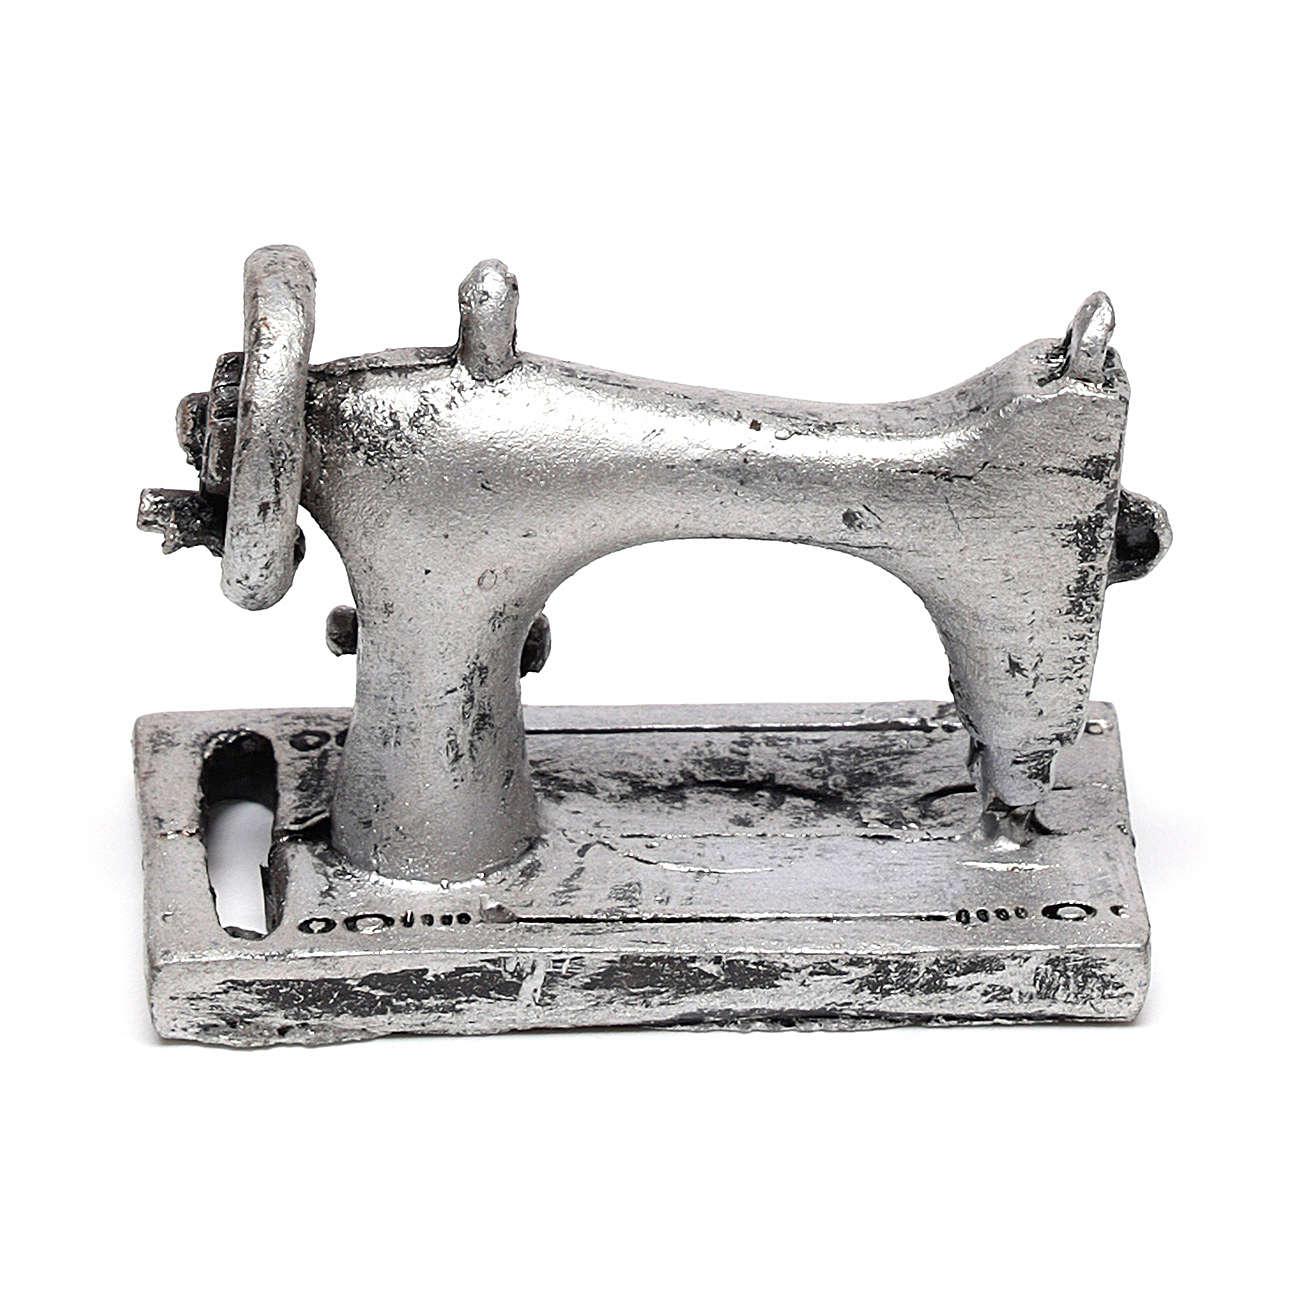 Máquina de coser 3x4x2 cm para belén 14-16 cm 4